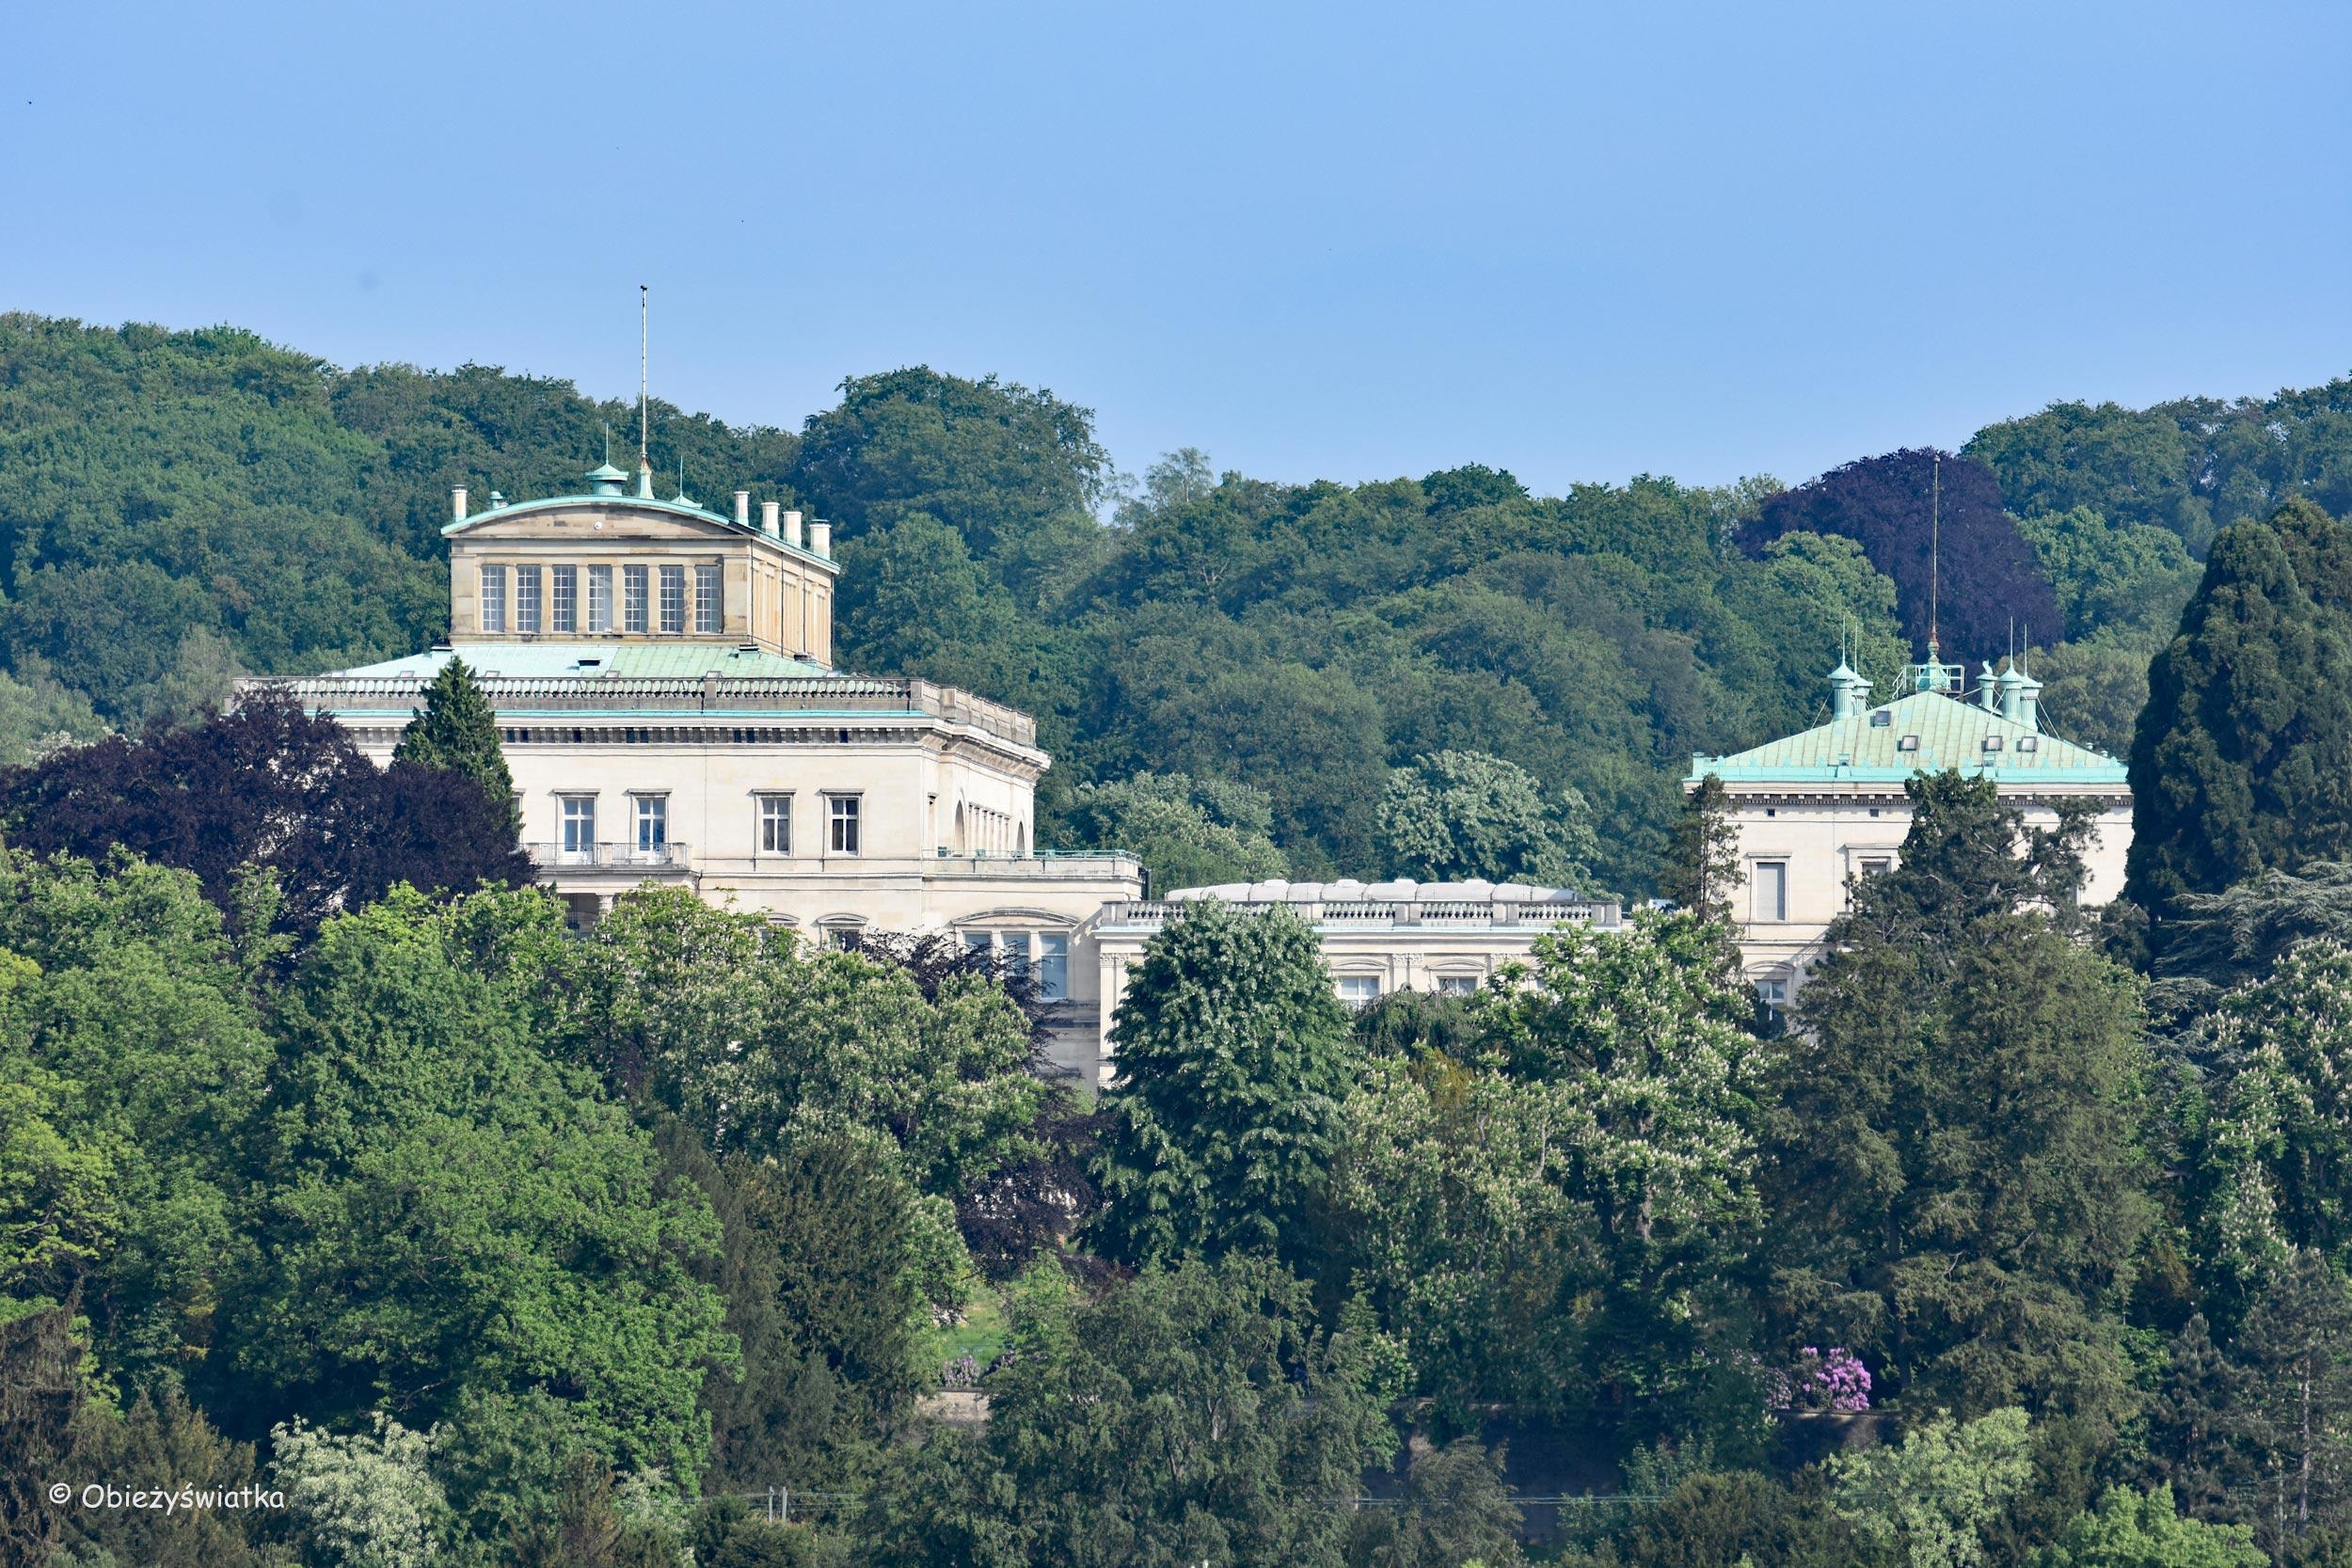 Villa Hügel - posiadłość rodziny Krupp